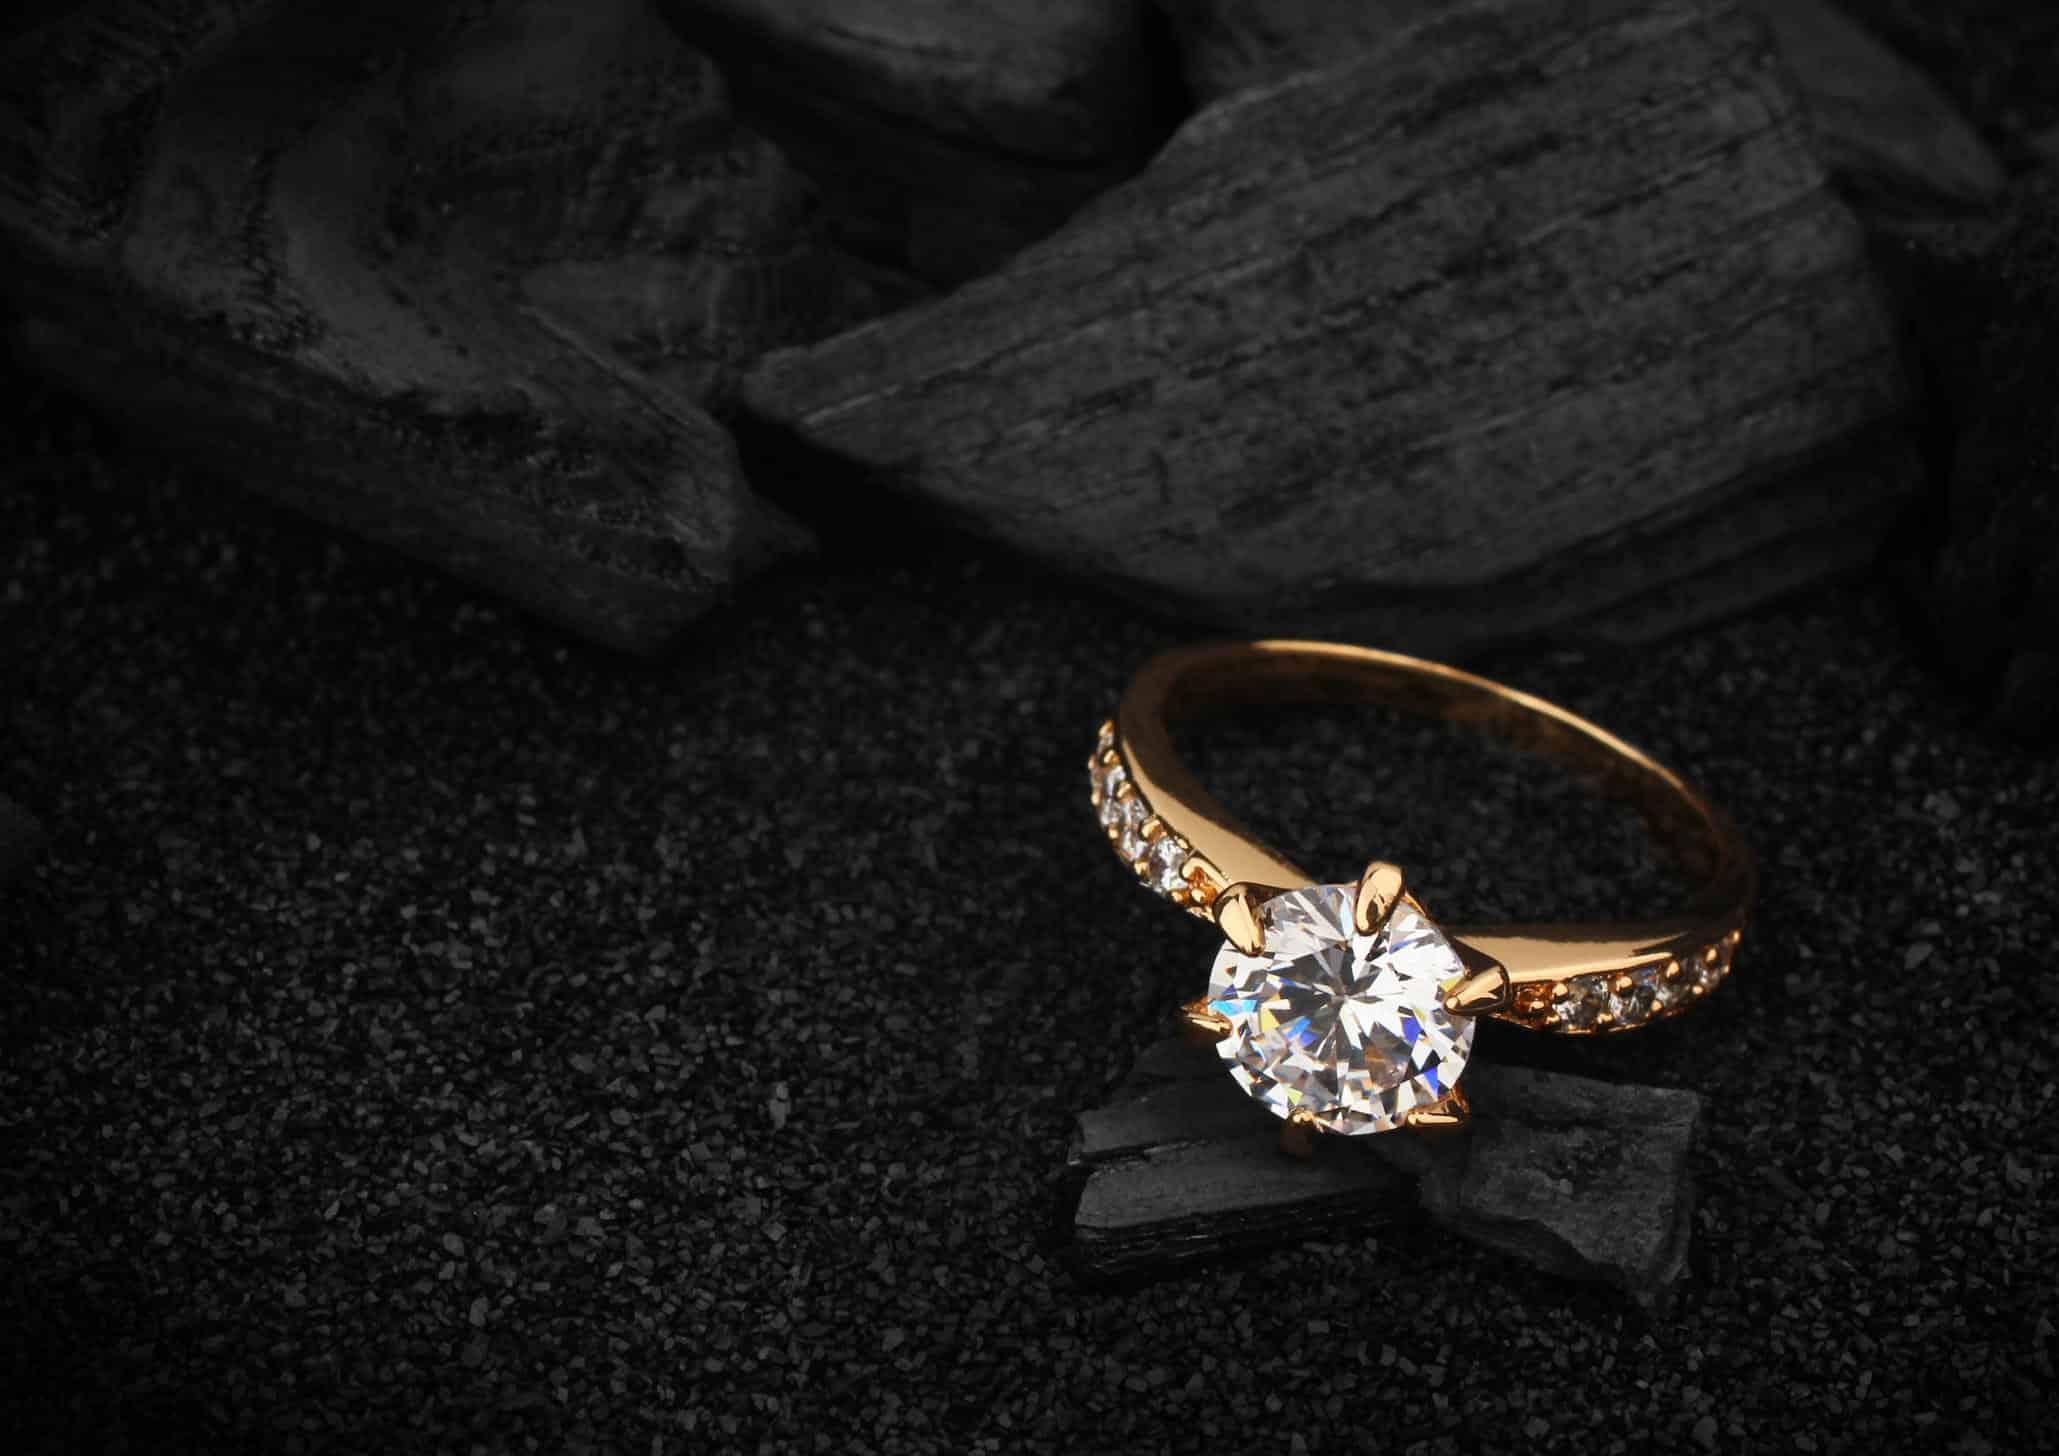 Ring resizing at Diamond Jim's